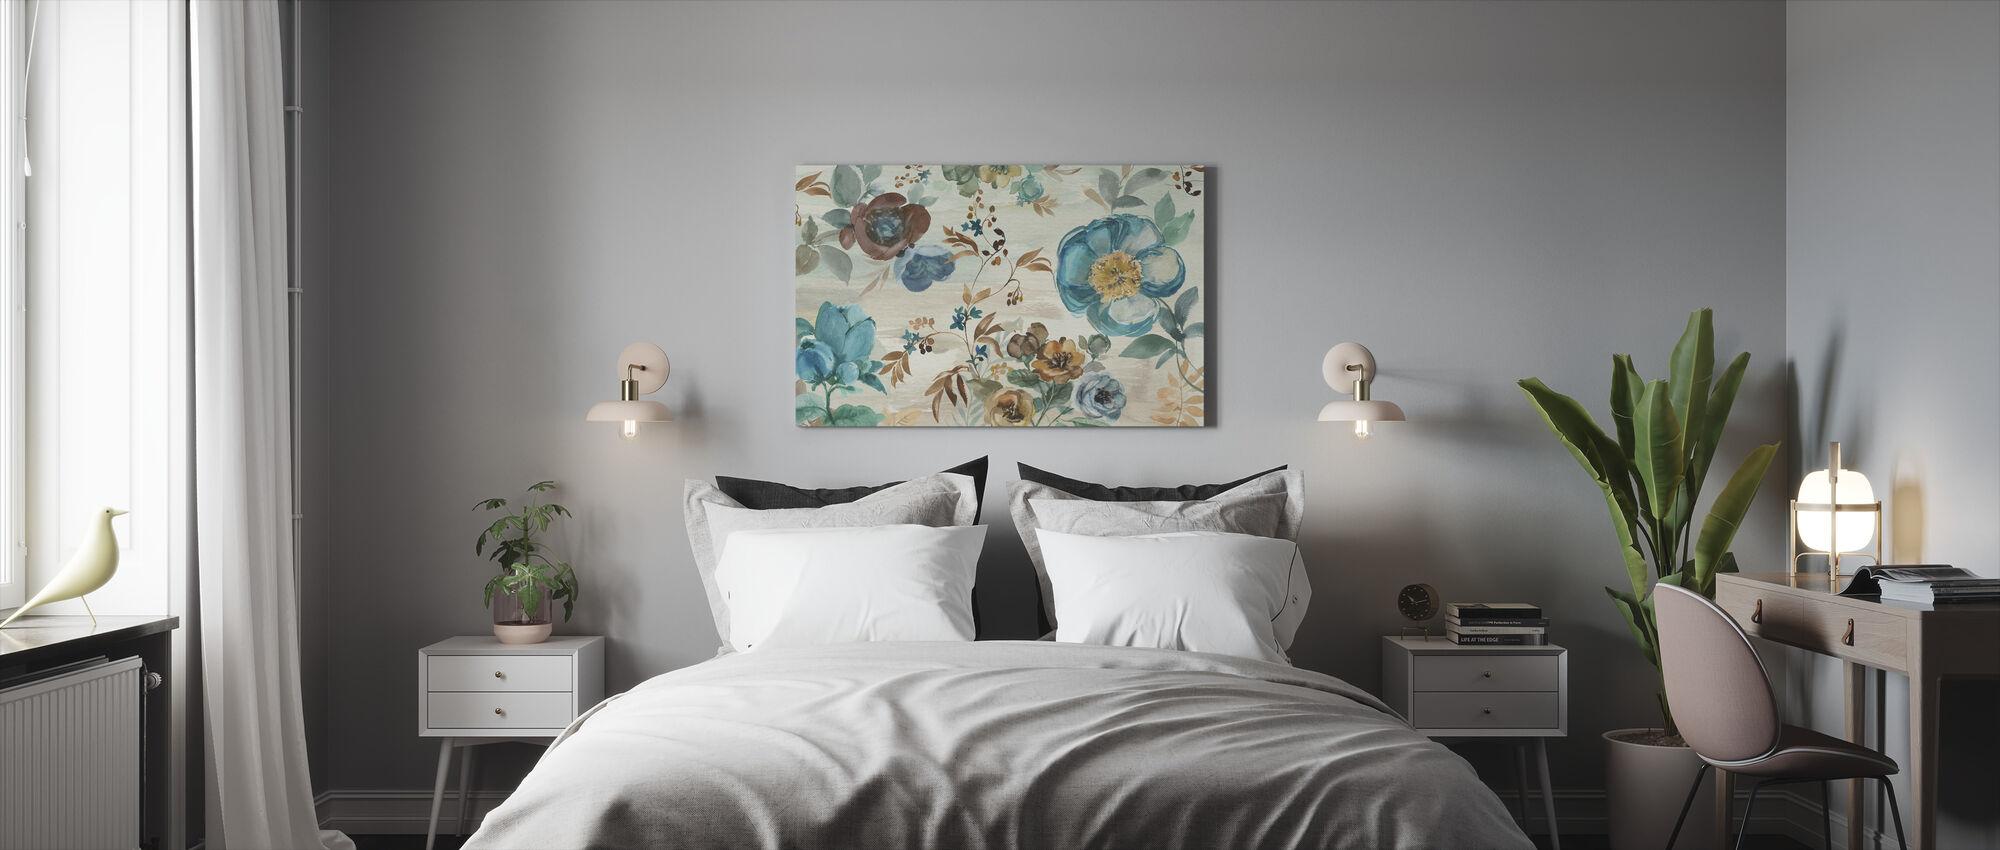 Turquoise Floral - Canvastaulu - Makuuhuone